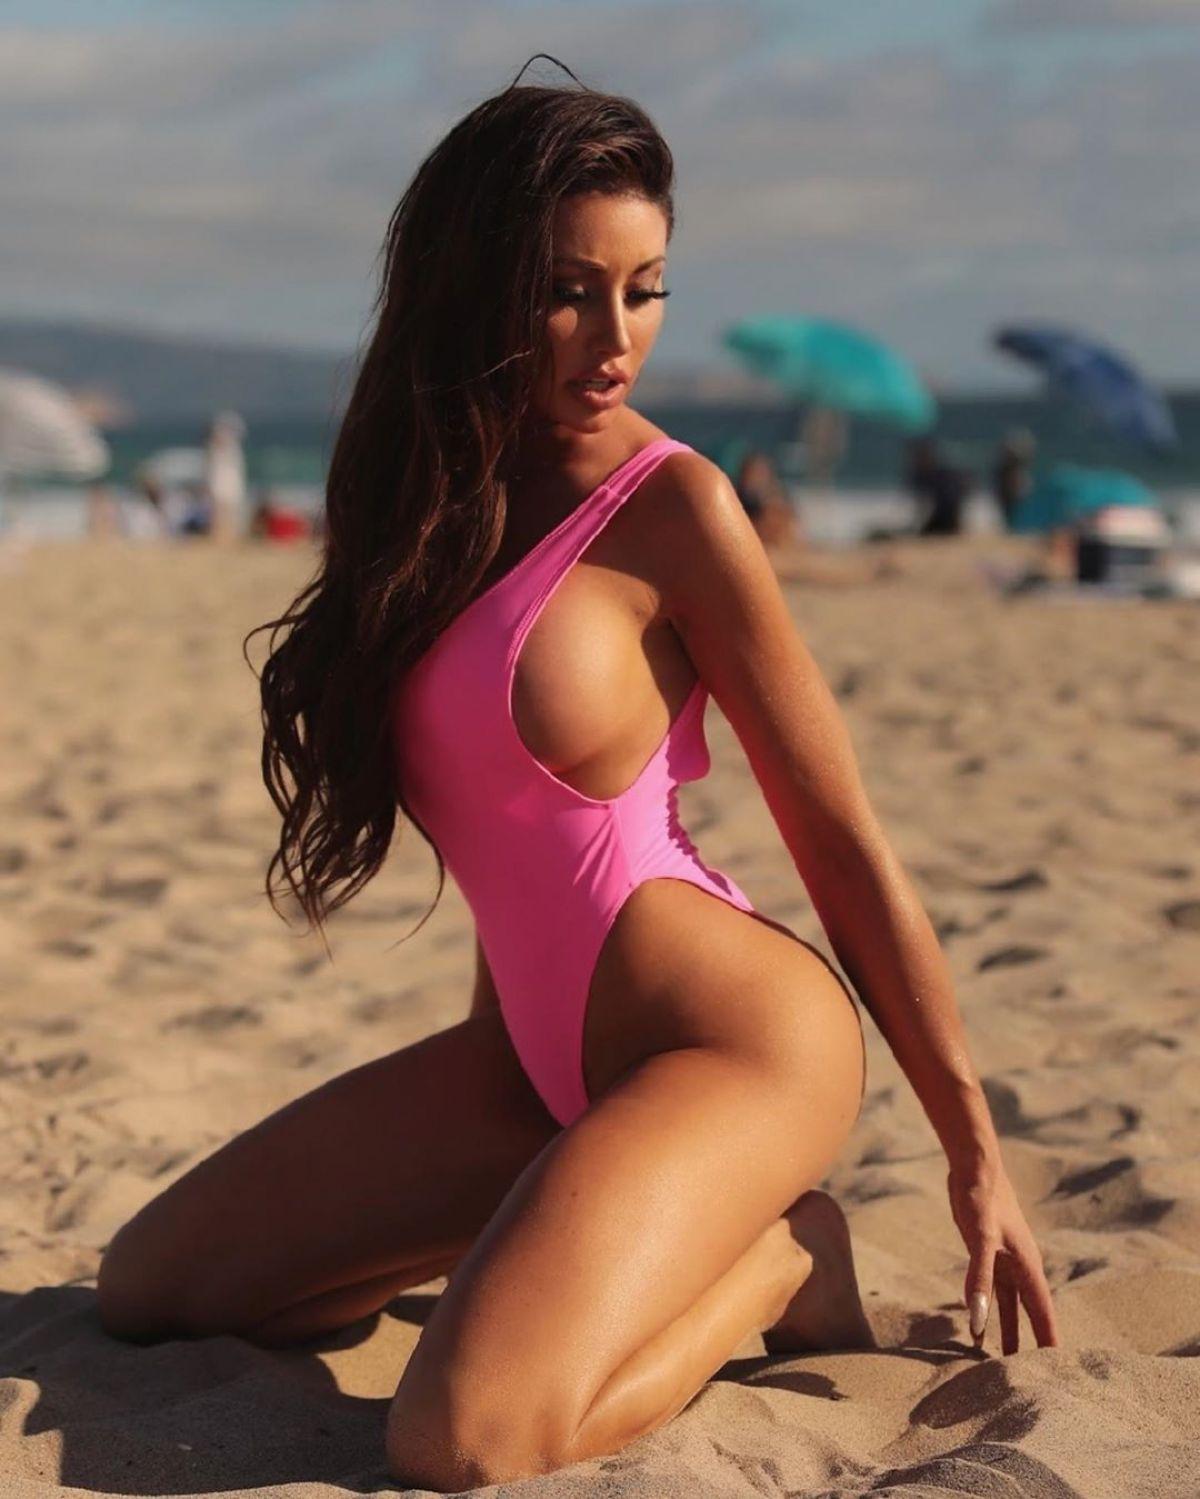 Holly Sonders Nude Leaks 2020 - Fapopedia